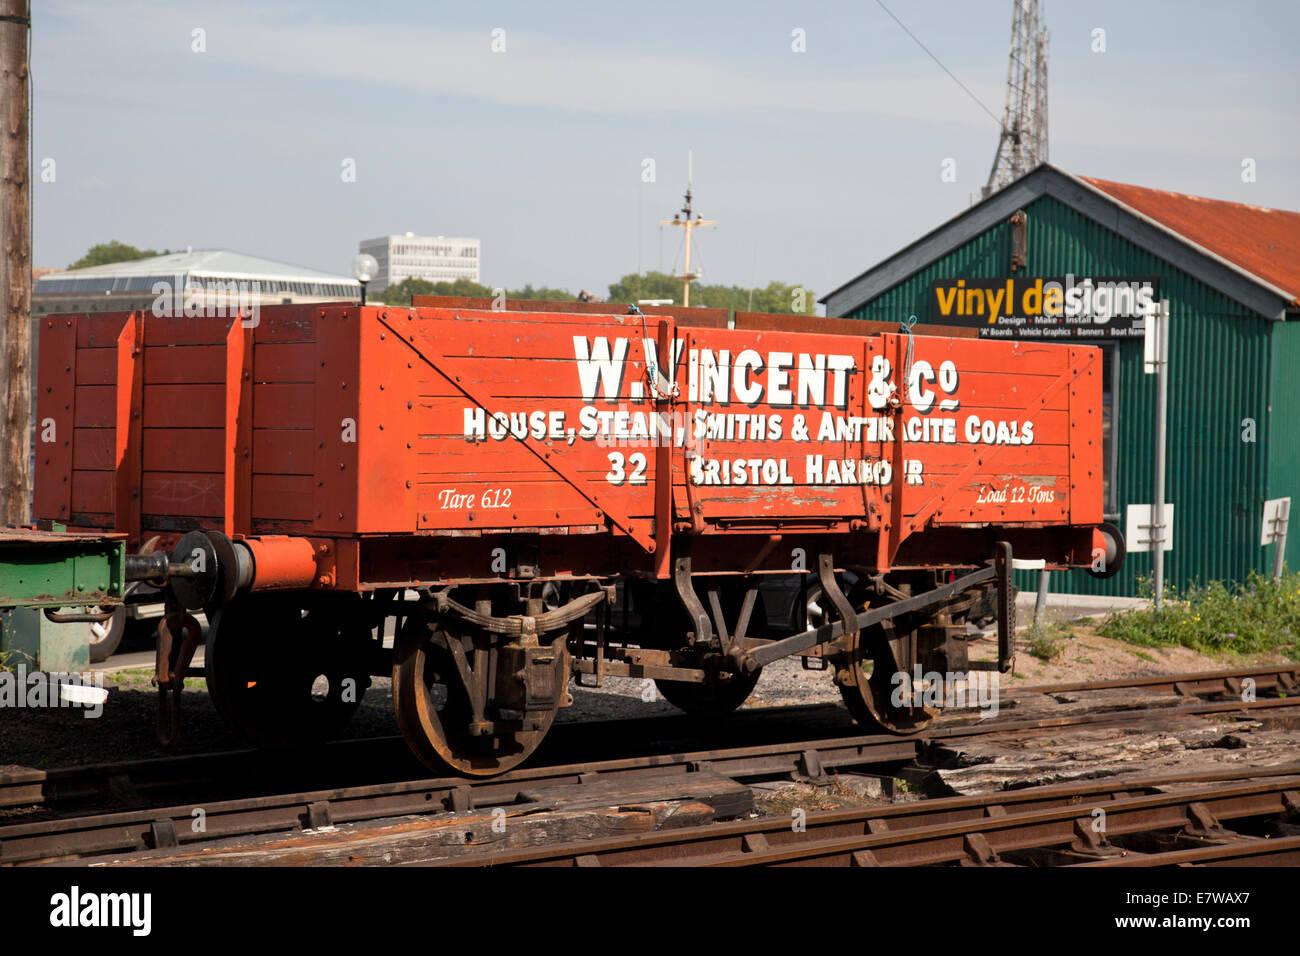 V Vincent & Co. railway coal truck Bristol Harbour Railway carriage, Bristol, UK - Stock Image